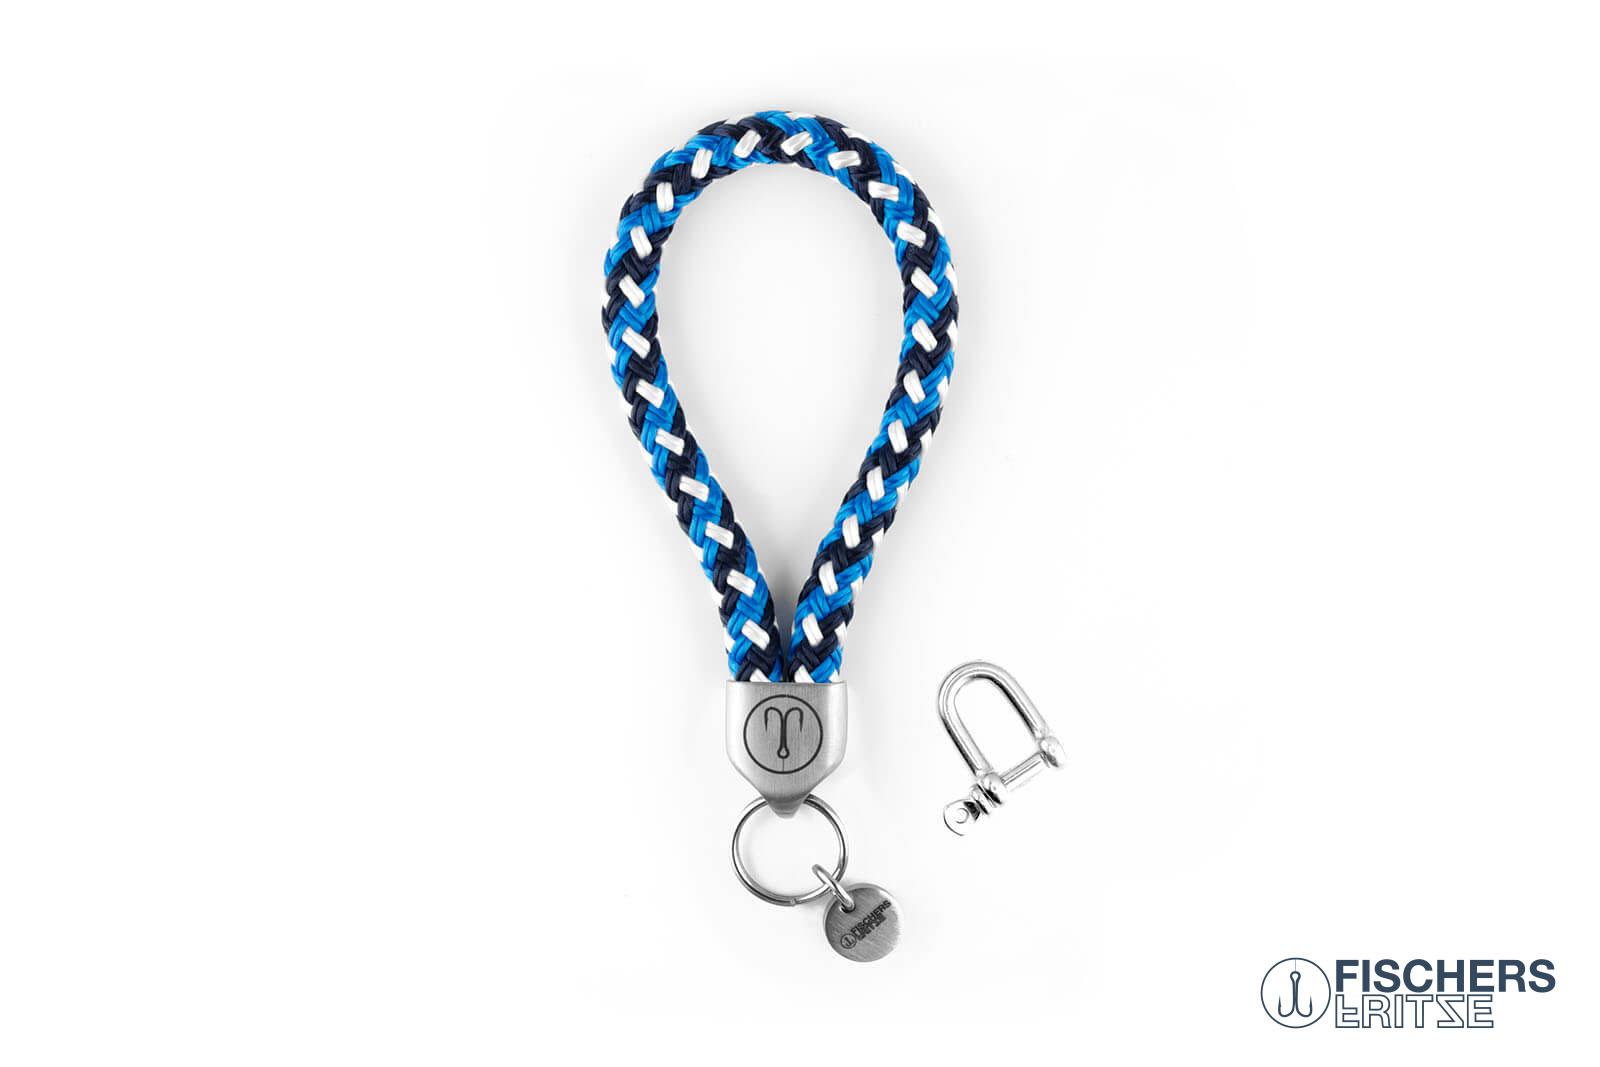 armband-fischers-fritze-dickerhering-blau gemustert-segeltau-schaekel